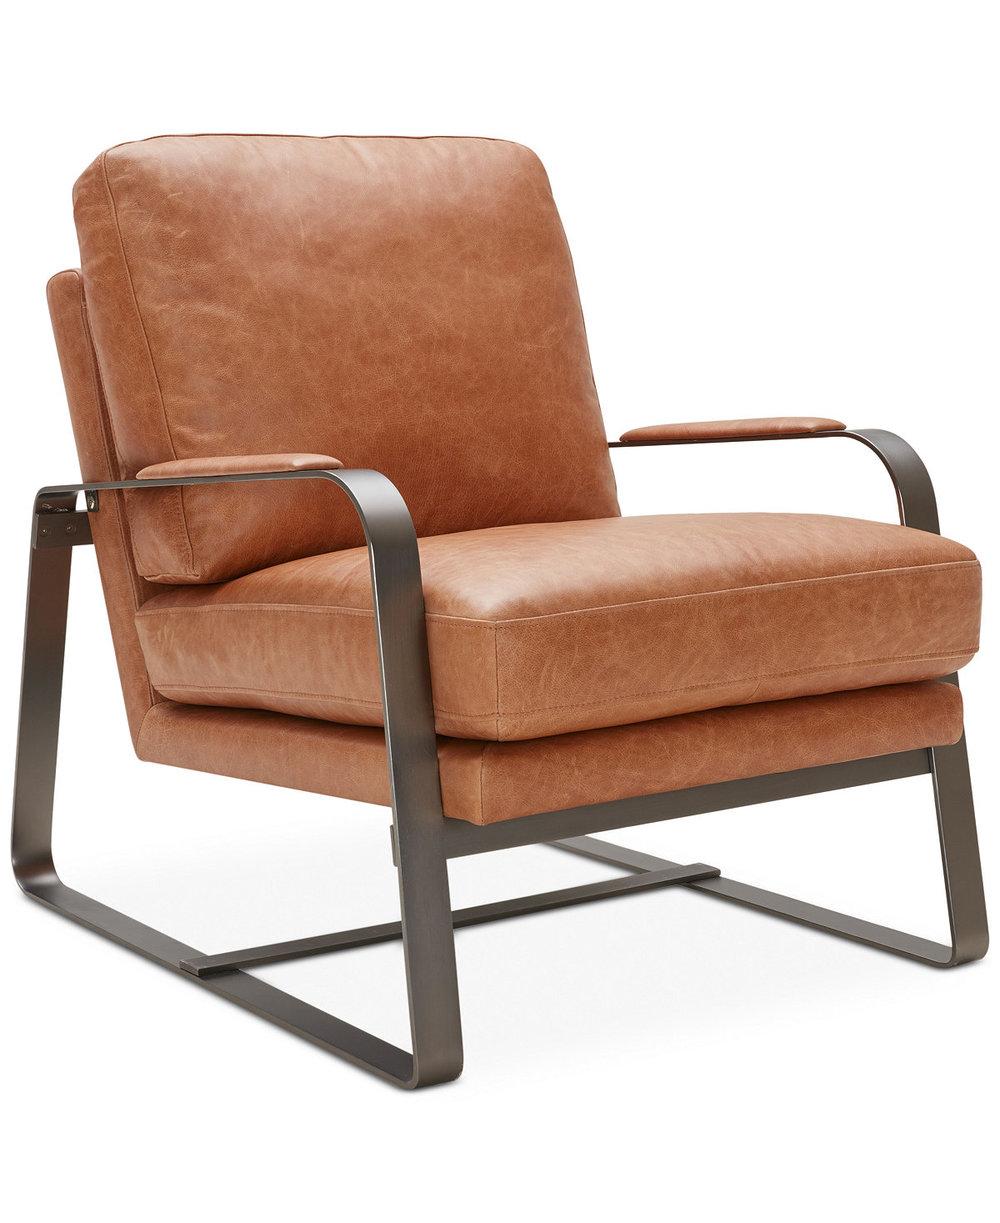 Macy's Jollene Chair $849